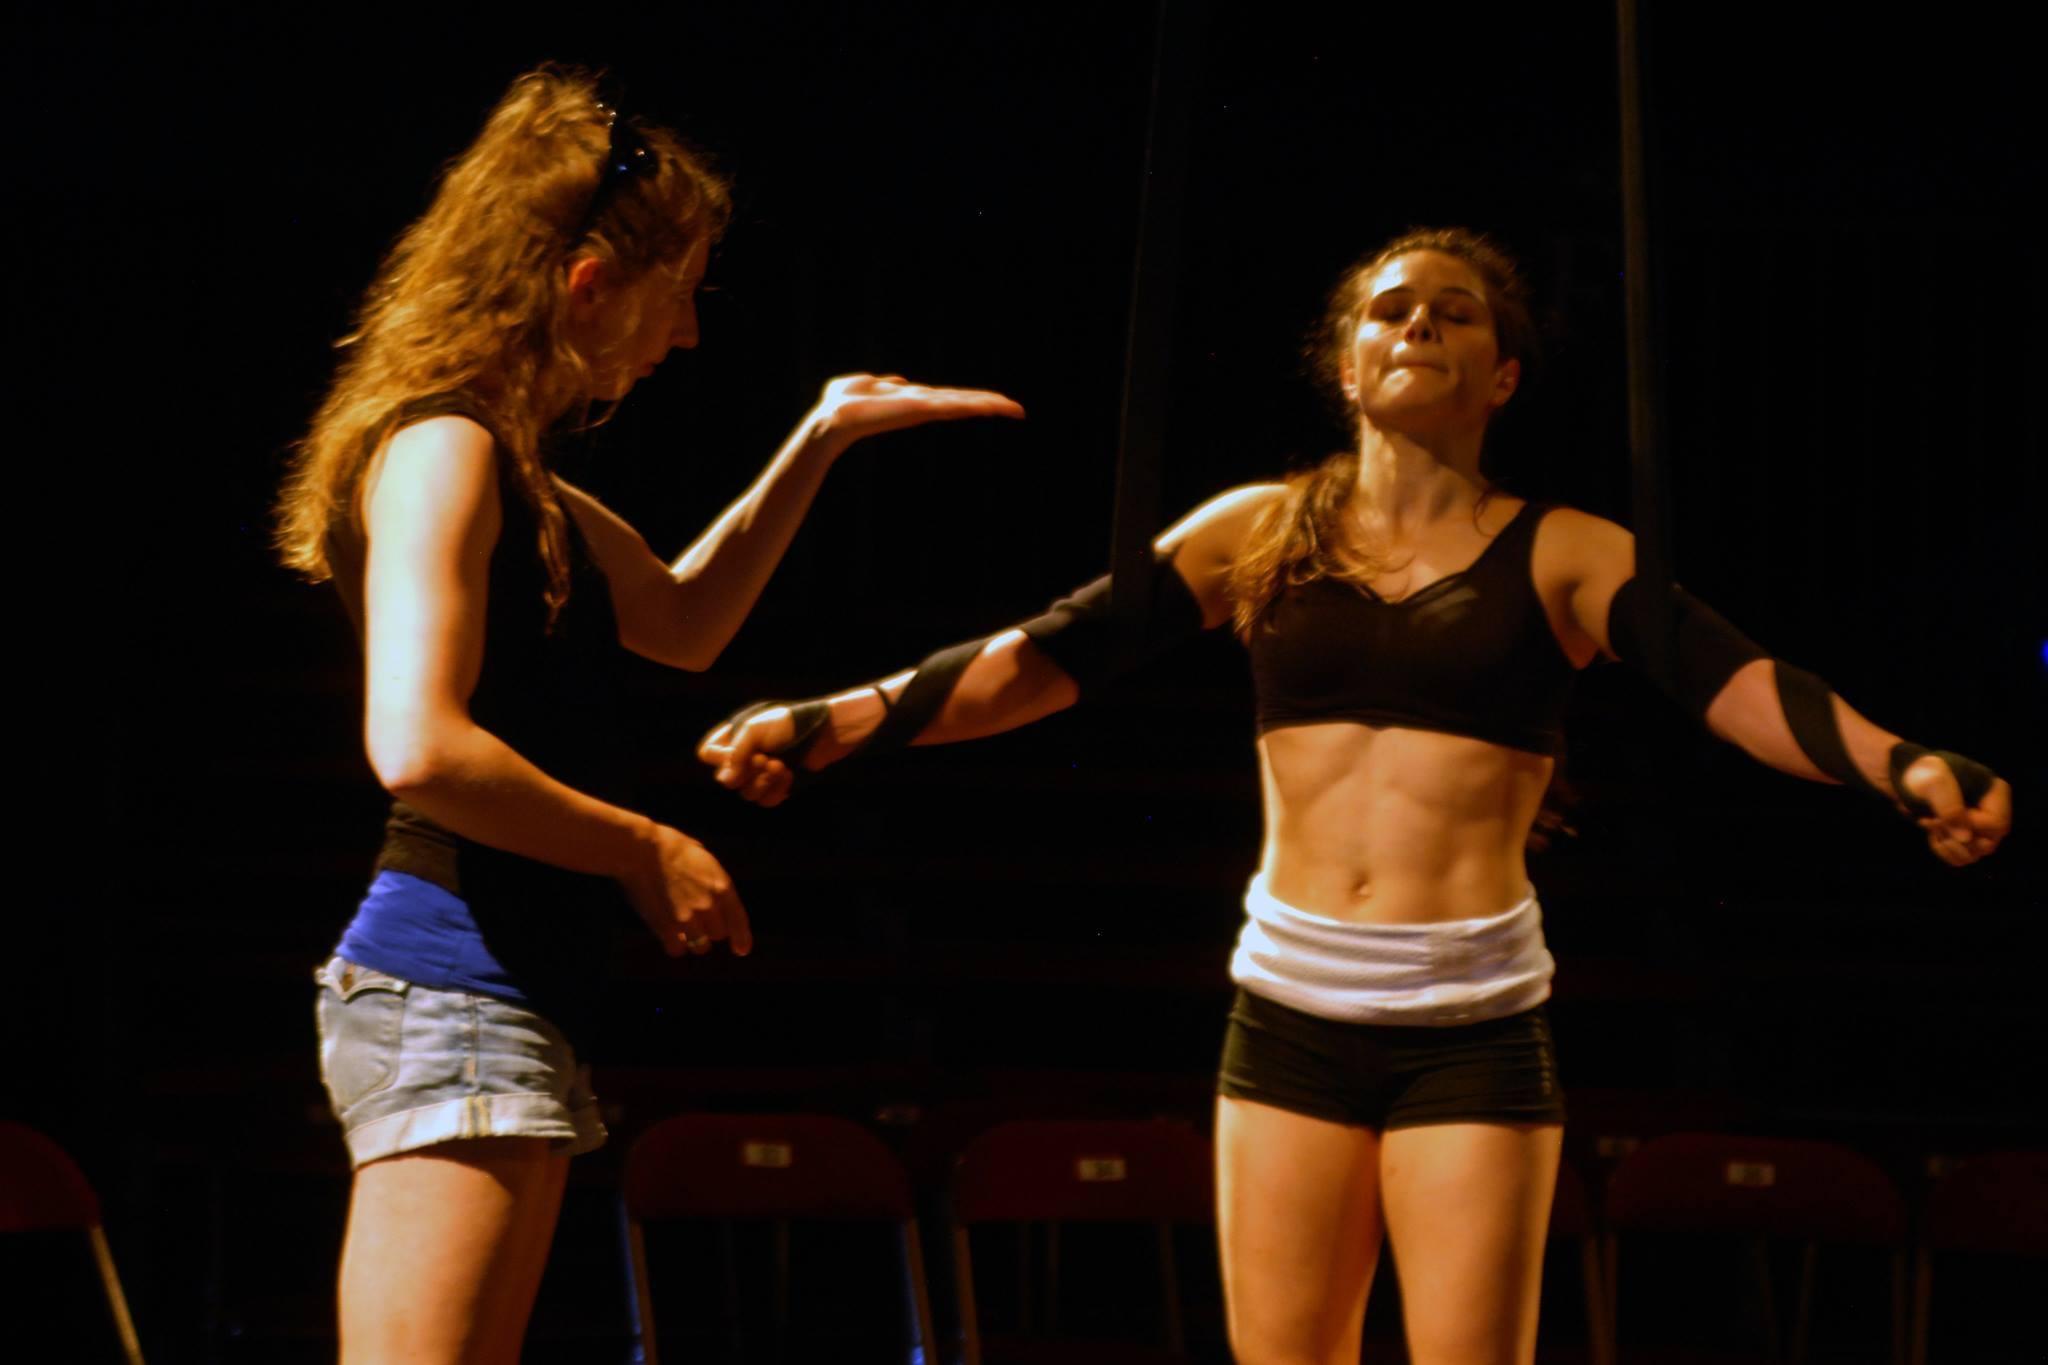 Mara-Charlotte-training-straps-together